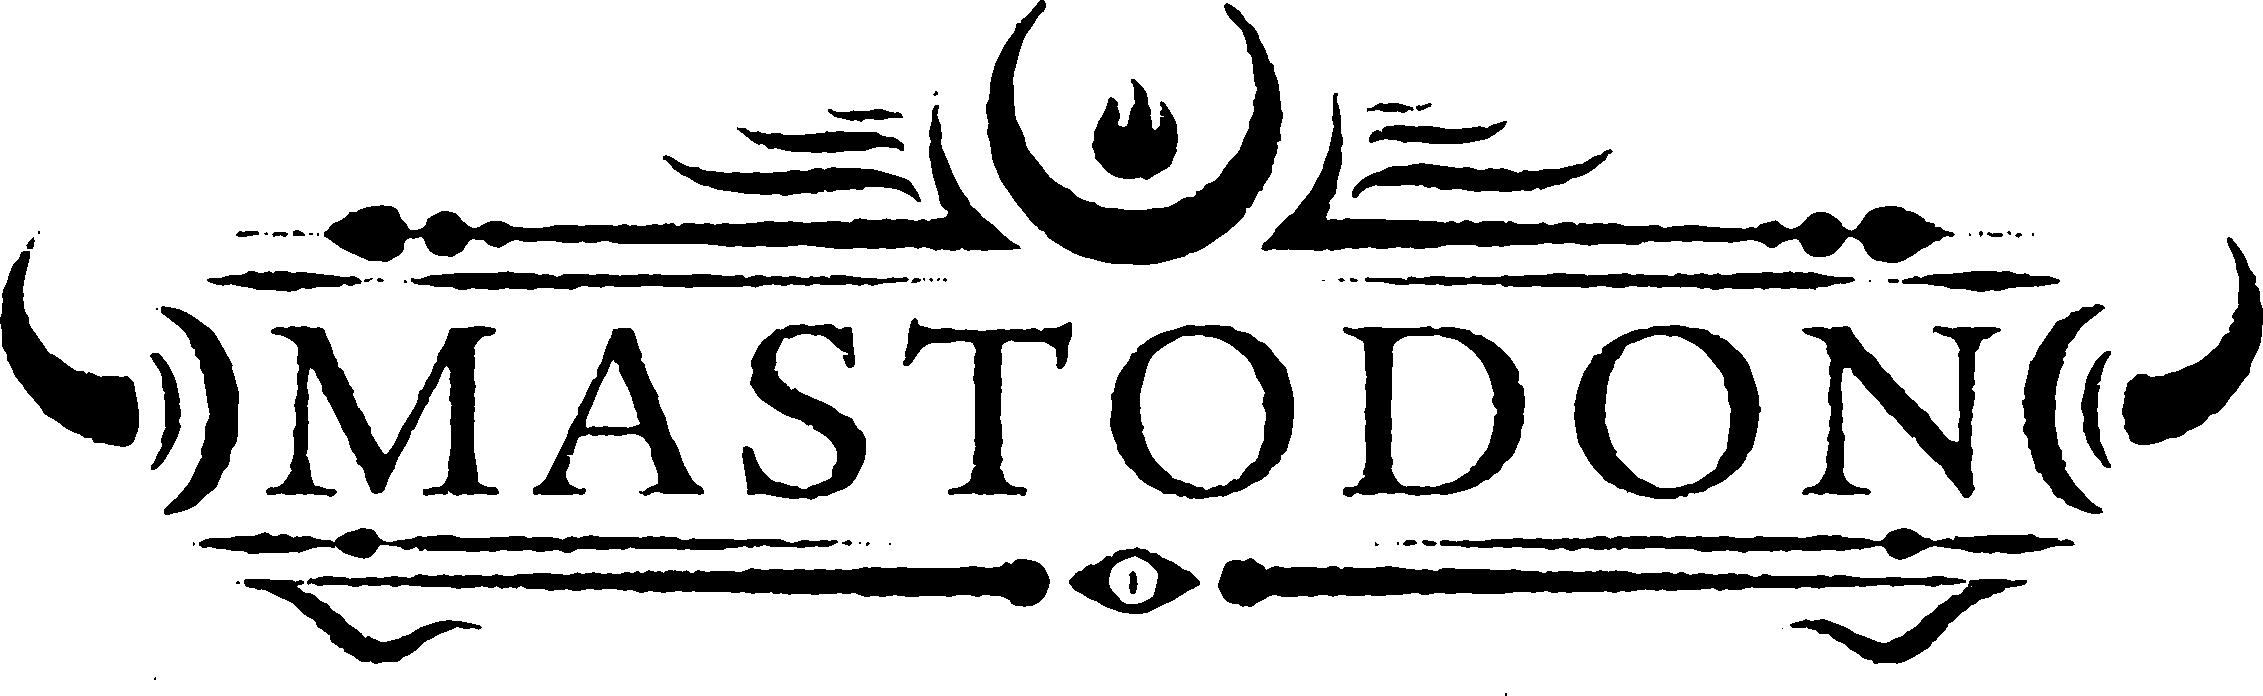 mastodon-emperor-of-sand-logo-extralarge_1485563459236